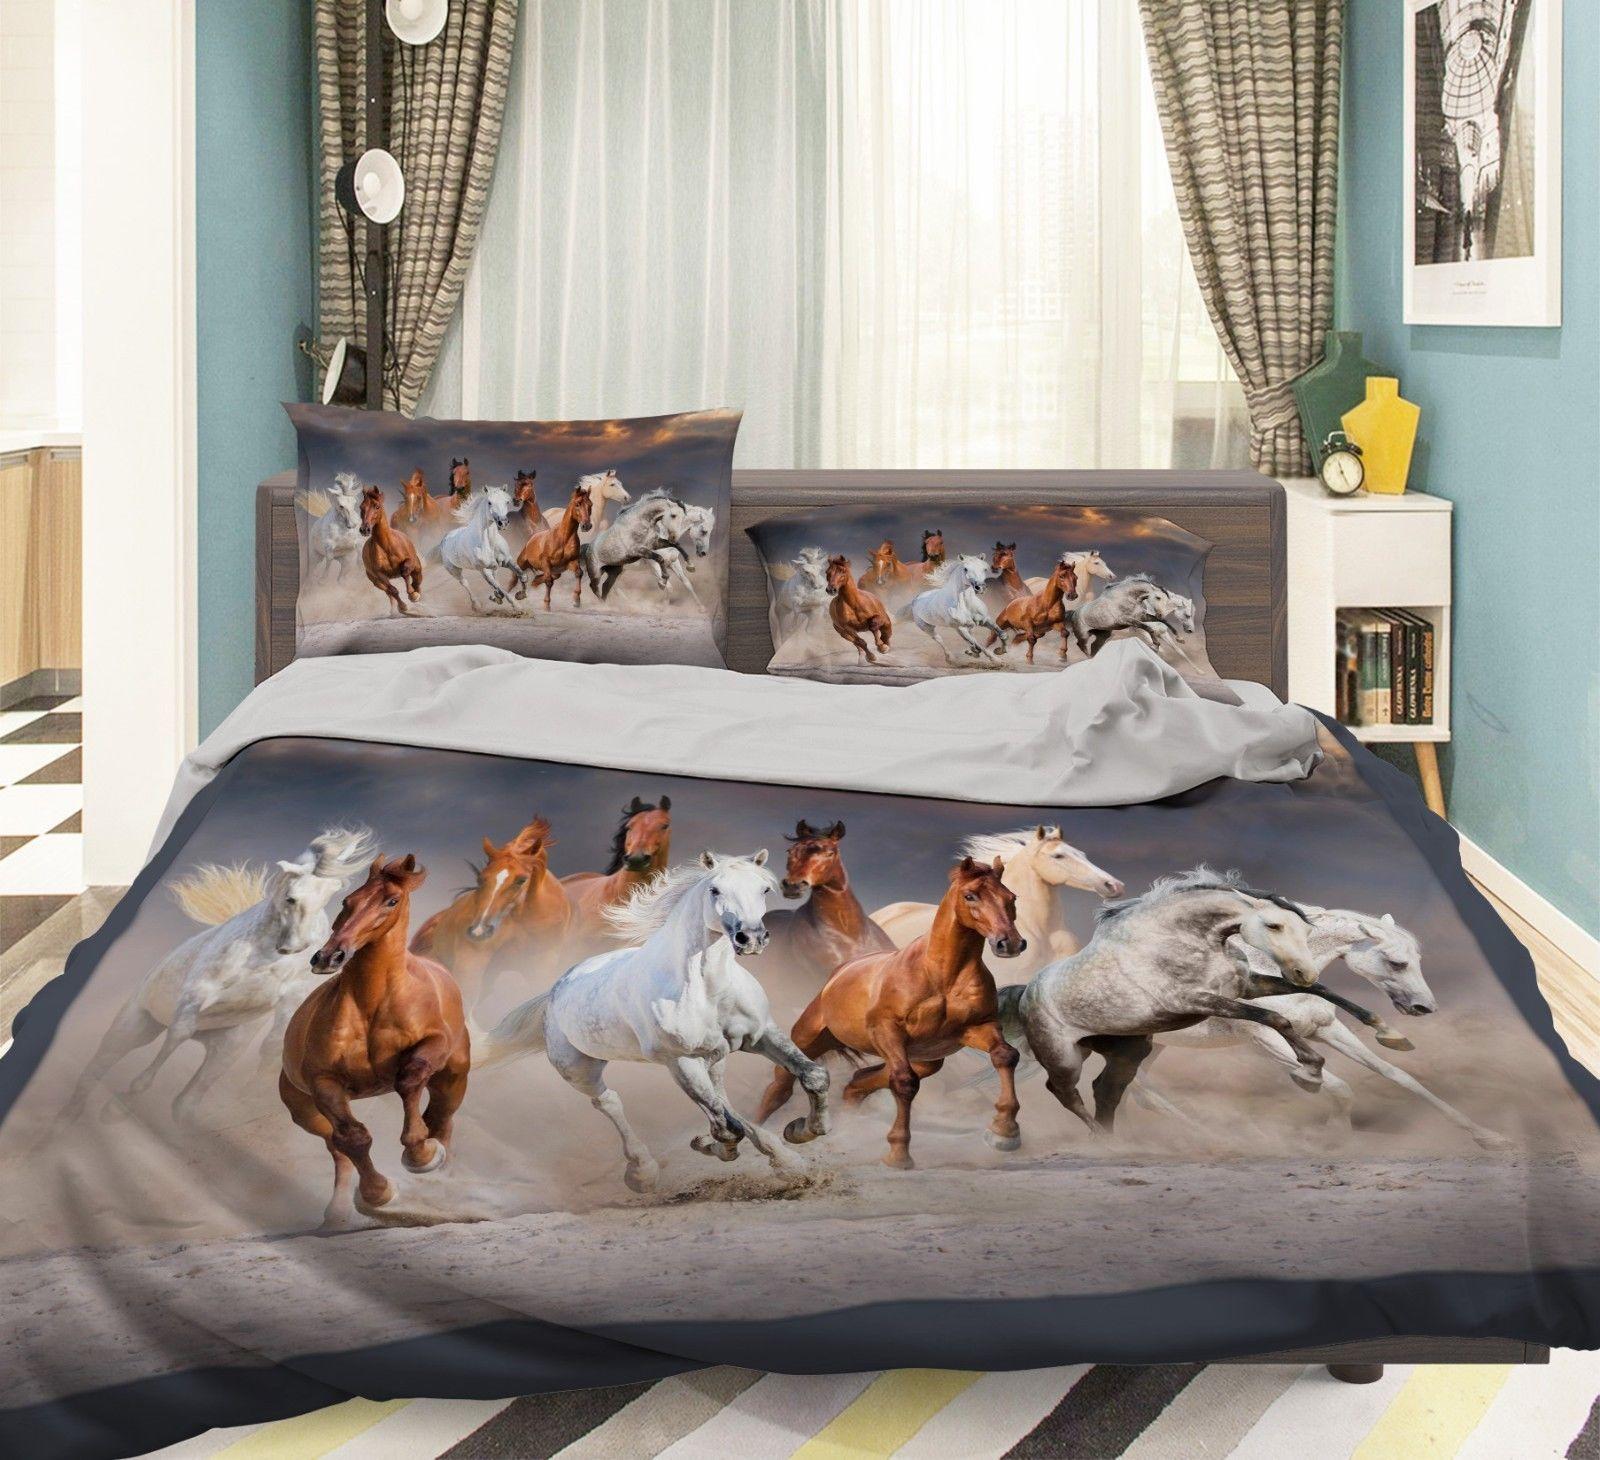 3D Run Horses 36 Bed Pillowcases Quilt Duvet Cover Set Single Queen King Size AU - $64.32 - $96.47